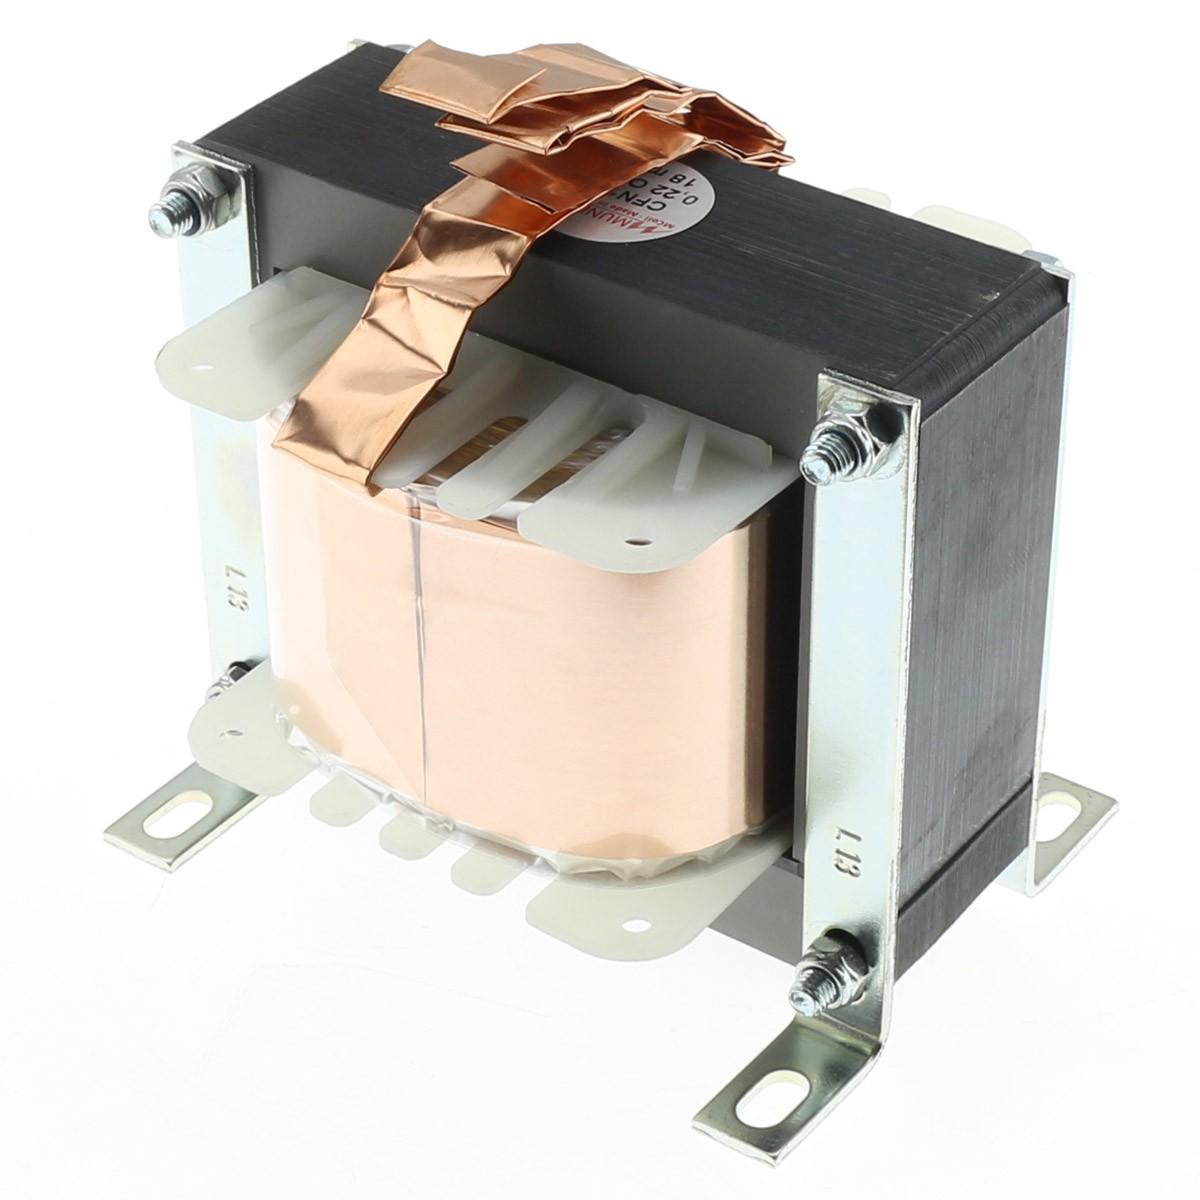 MUNDORF MCOIL CFN12 Copper Coil 8.2mH